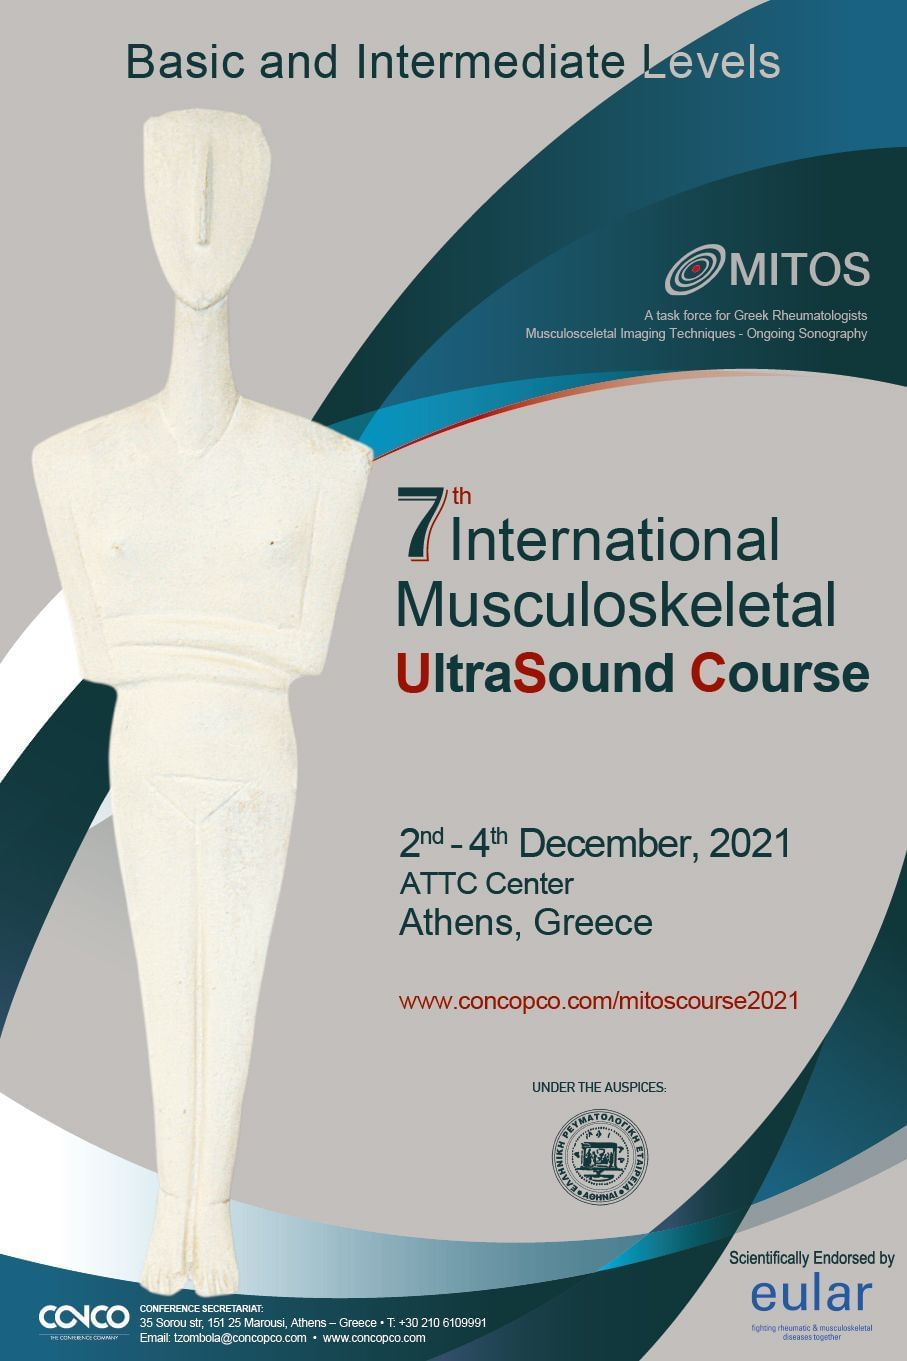 7th INTERNATIONAL MUSCULOSKELETAL ULTRASOUND COURSE